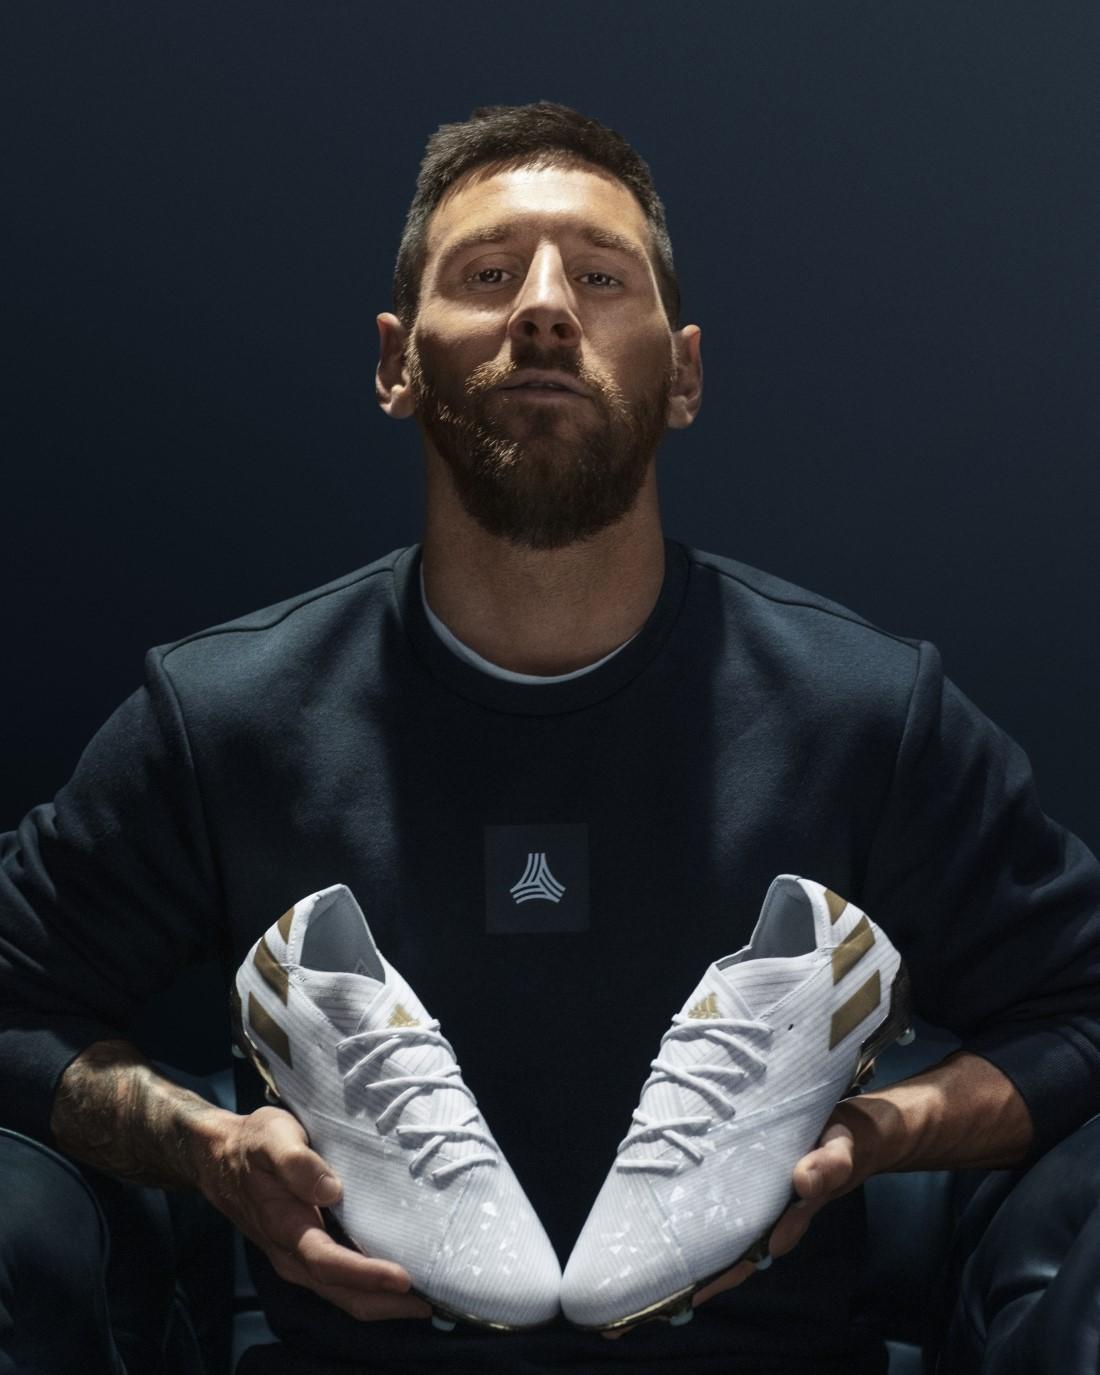 adidas - Lionel Messi NEMEZIZ MESSI 15 YEARS